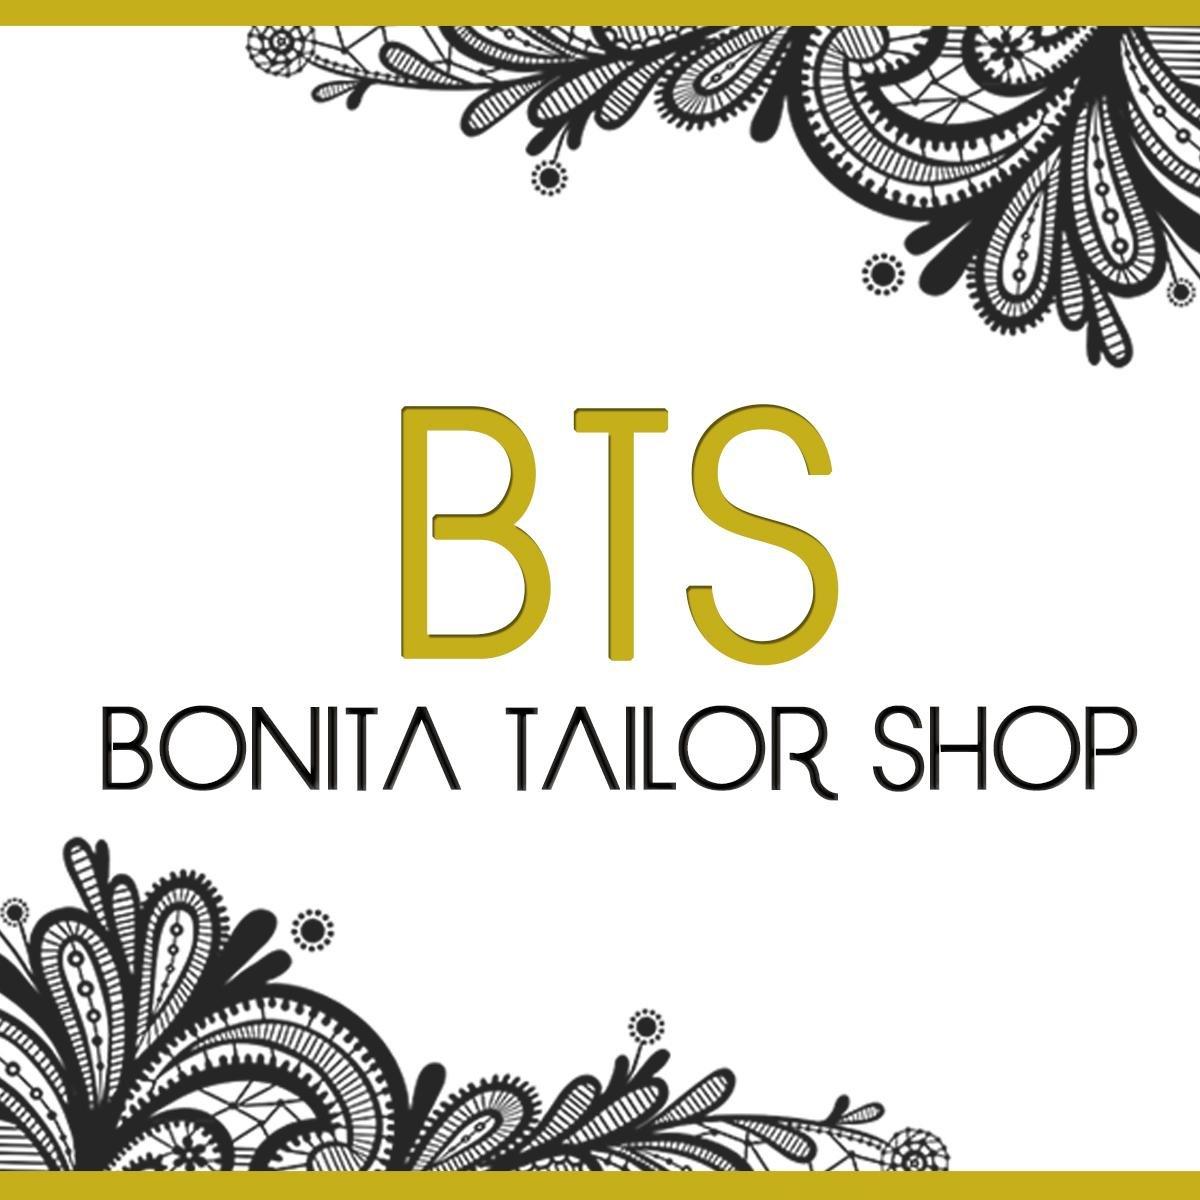 bonita tailor shop bonitatailor twitter bonita tailor shop